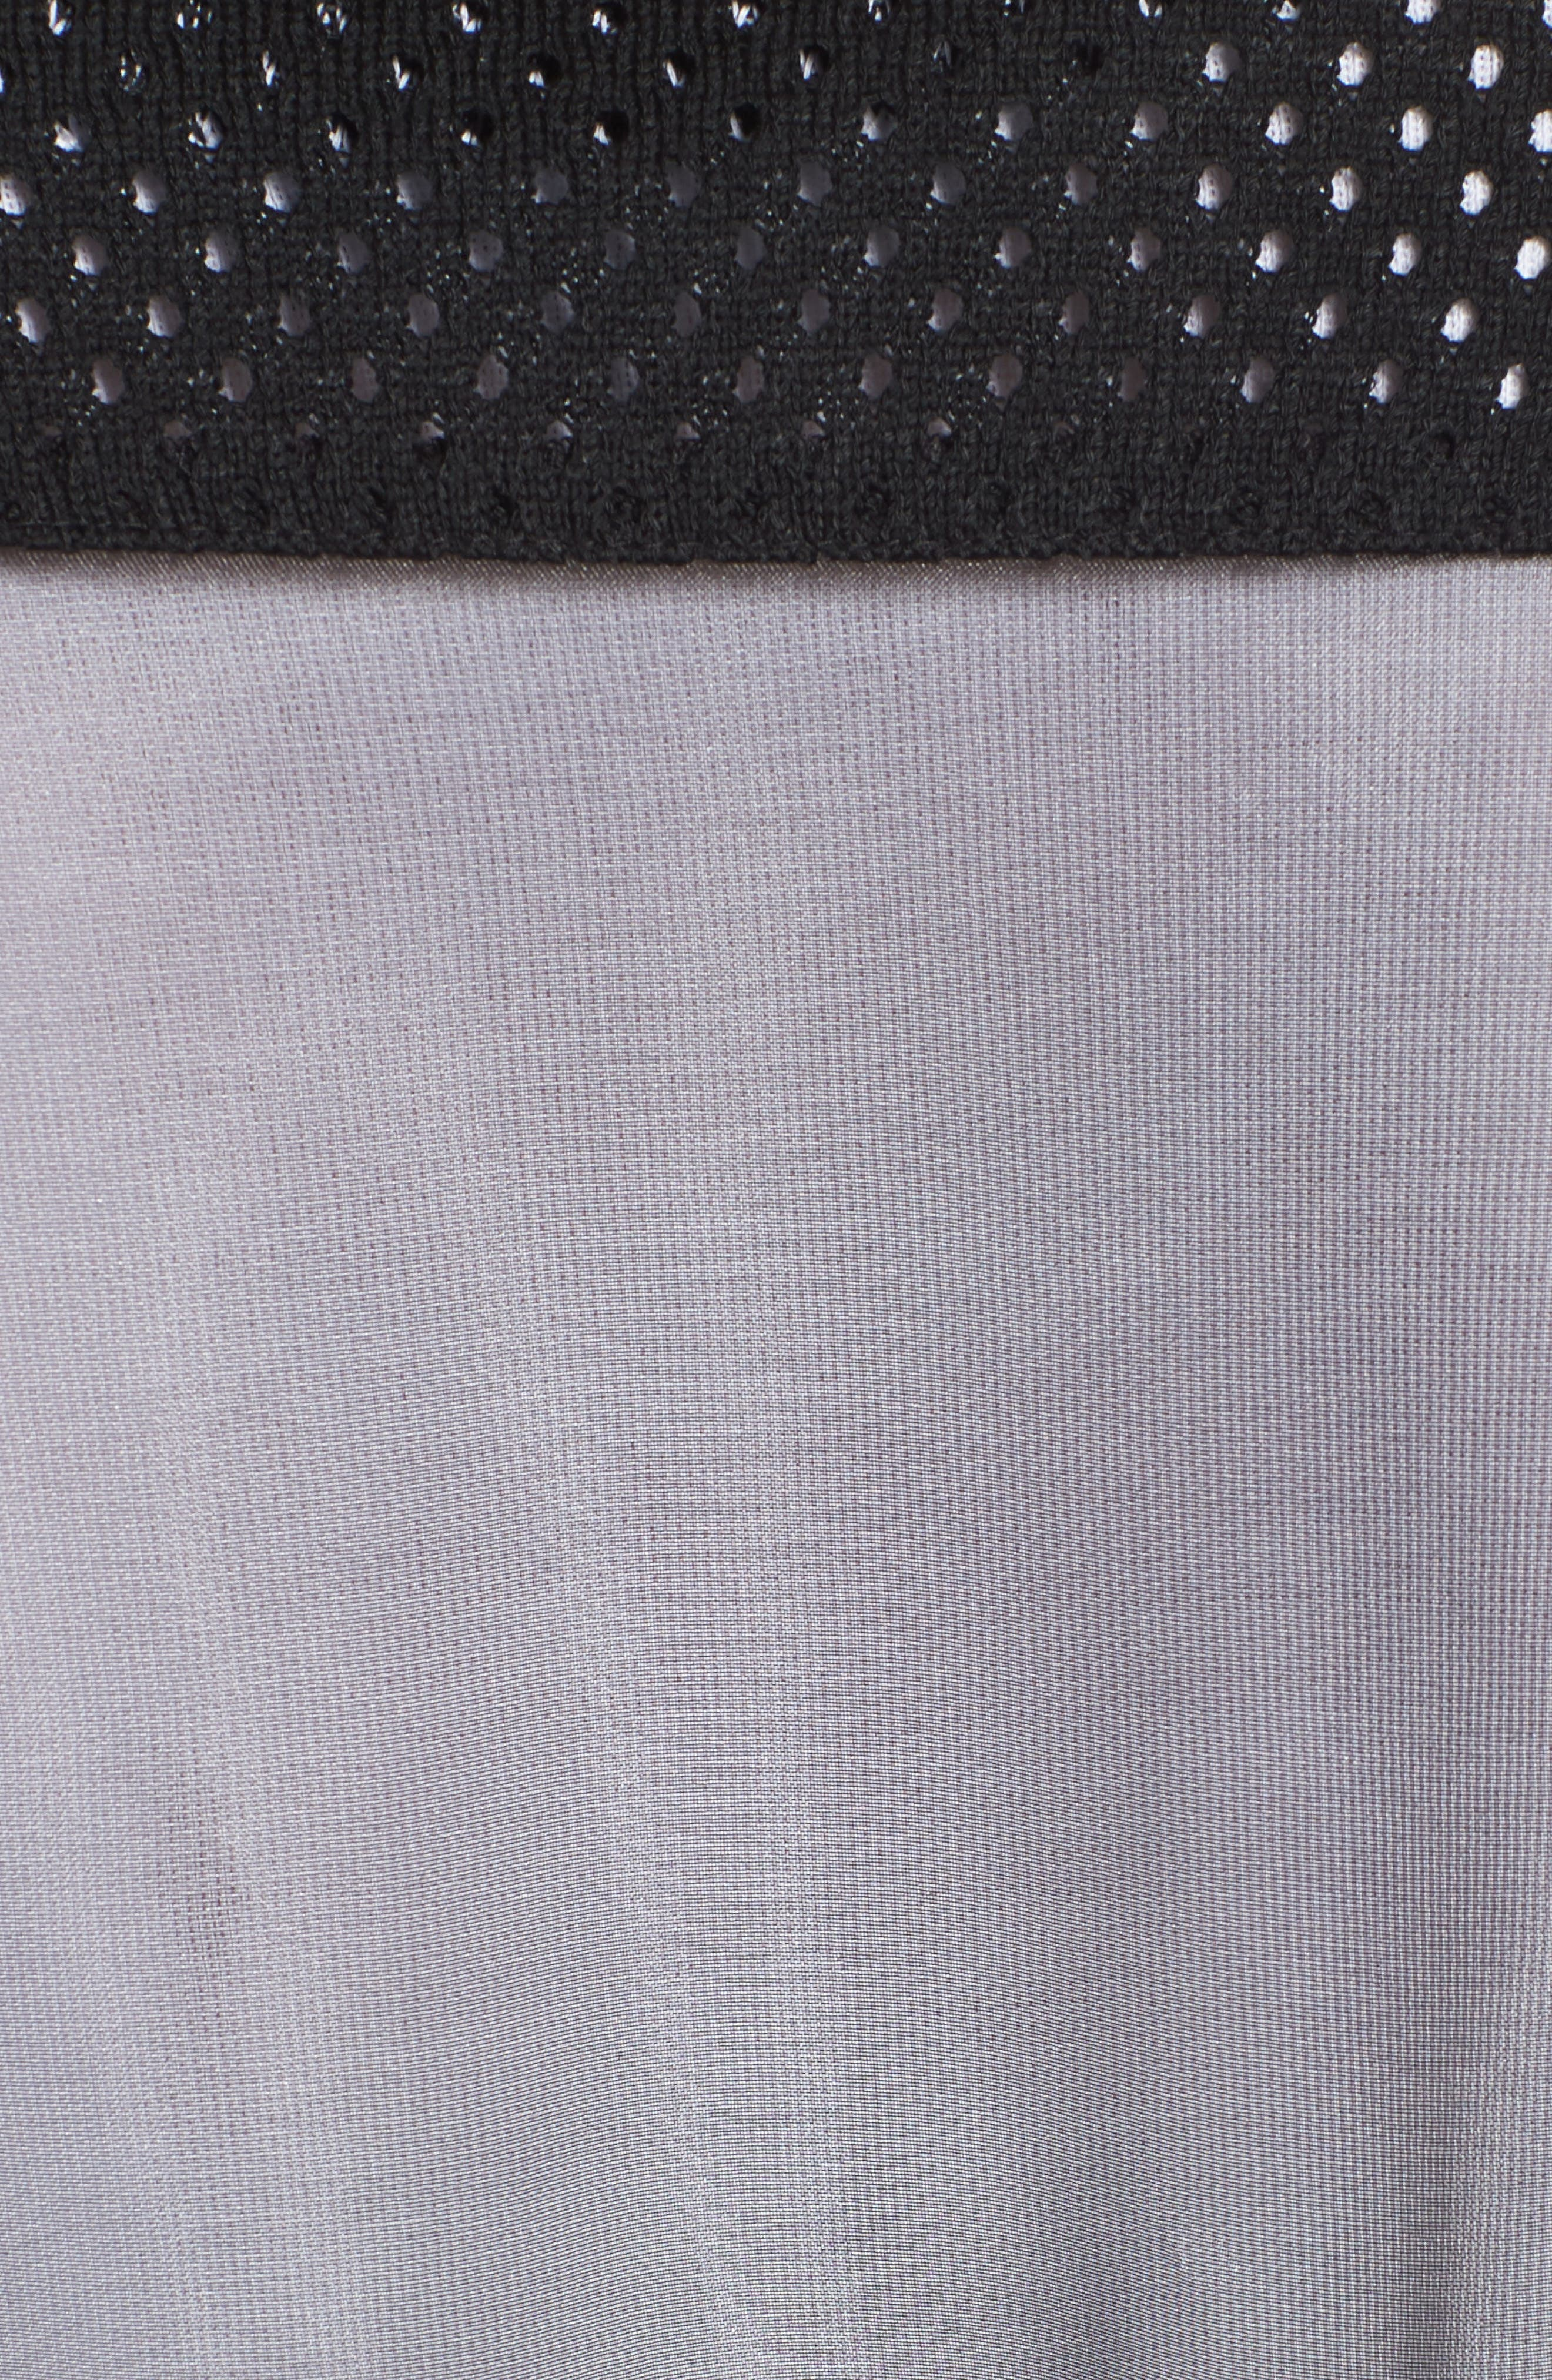 Sheer Jacket,                             Alternate thumbnail 6, color,                             001